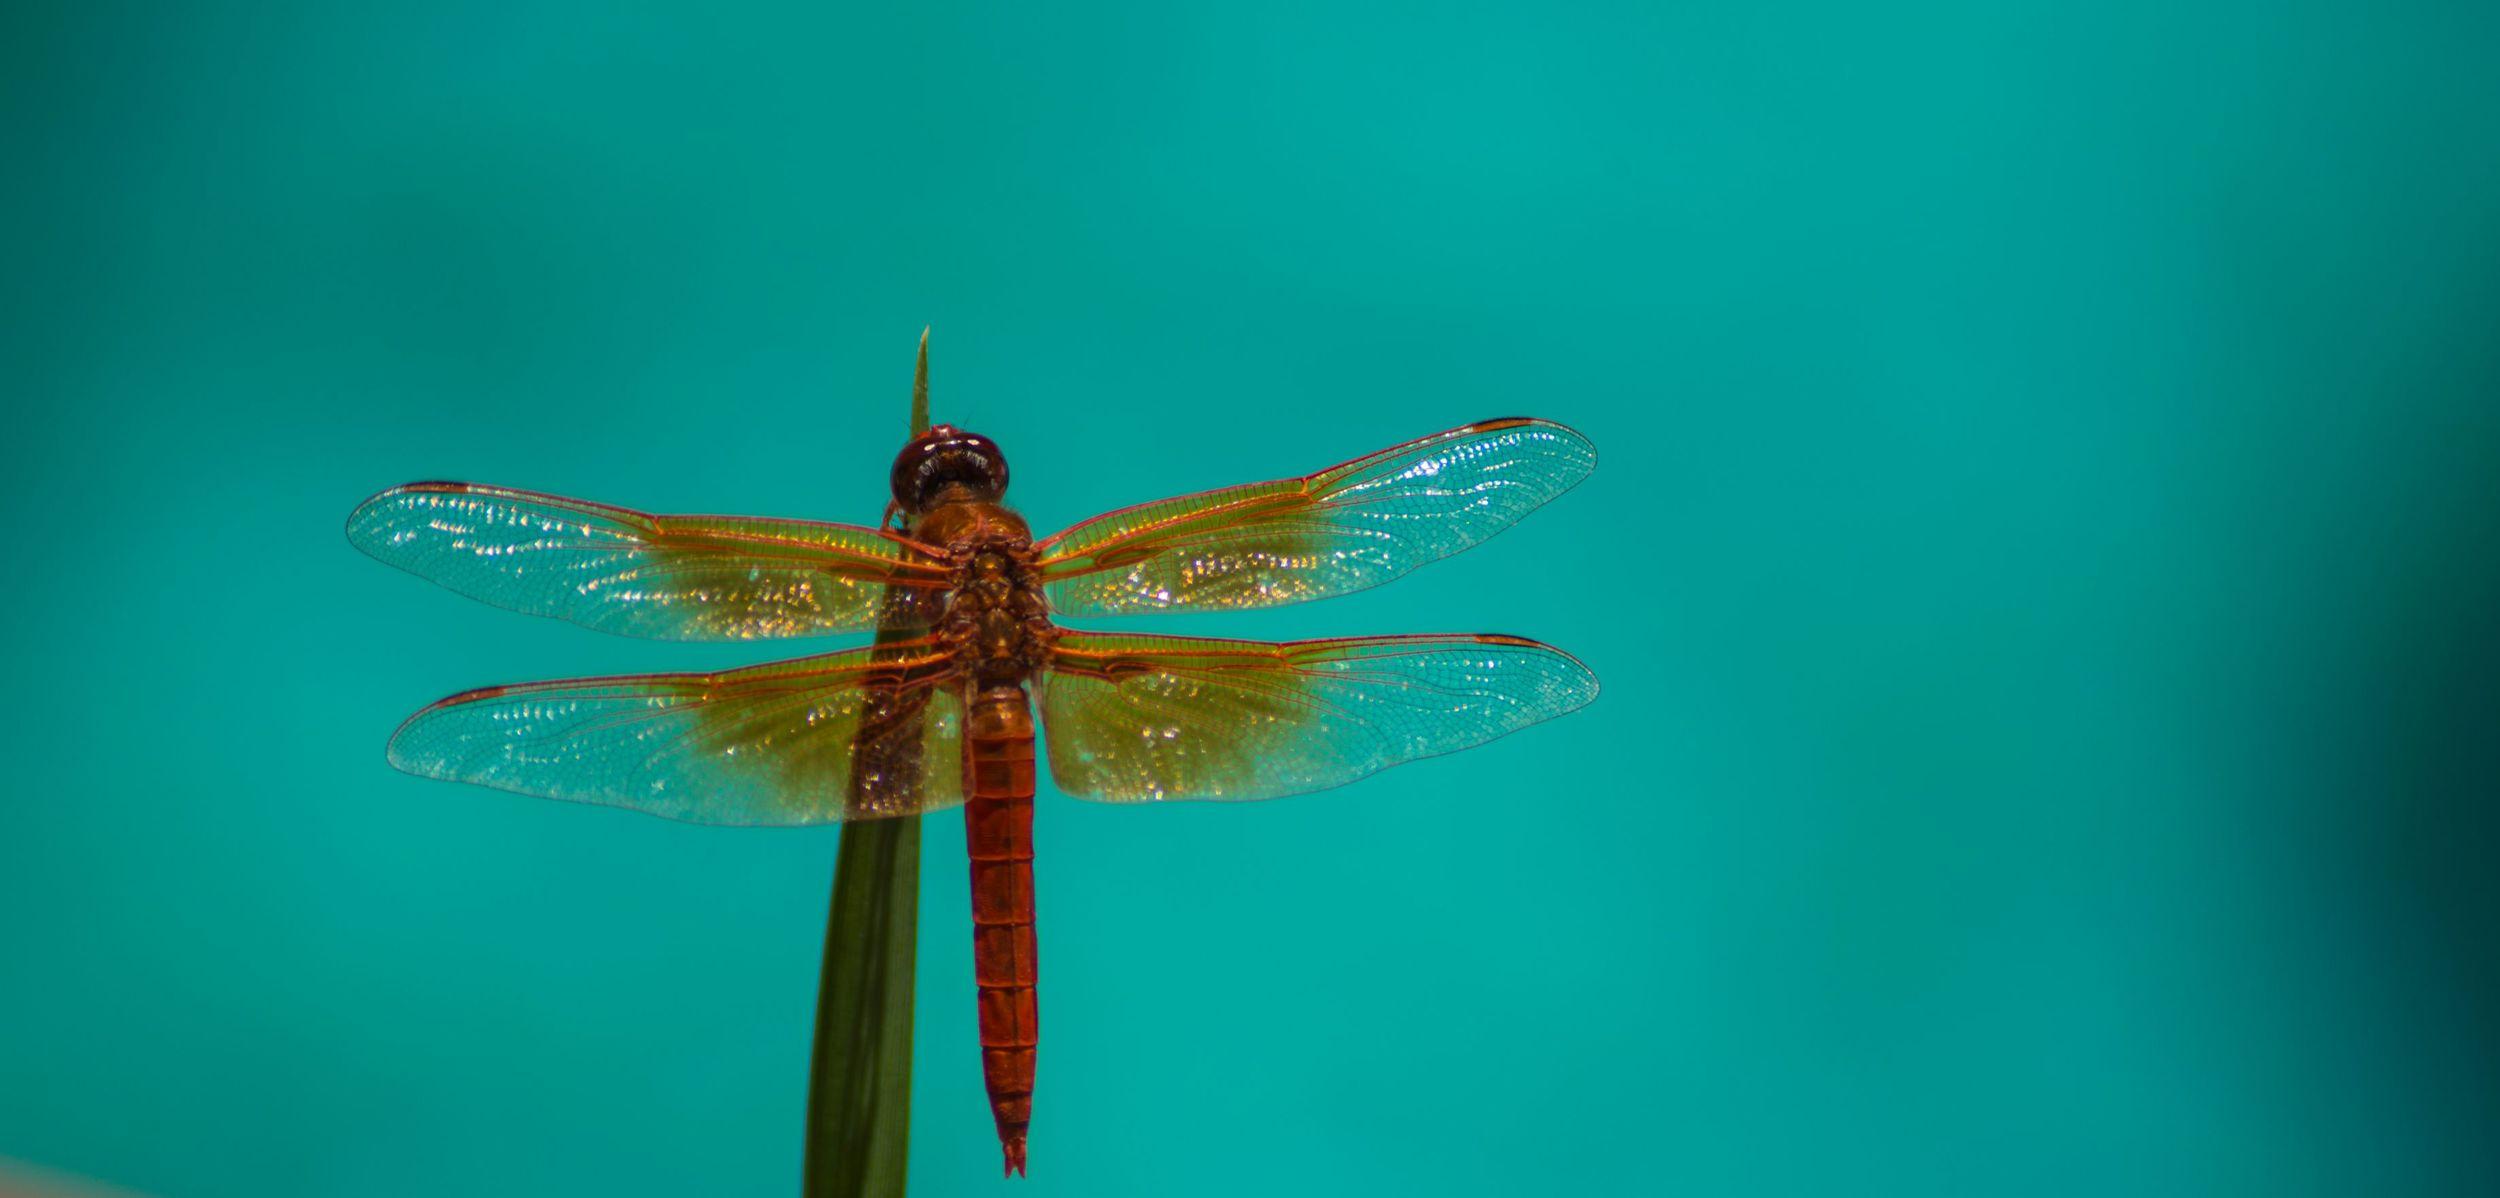 Dragonfly's Back.jpg